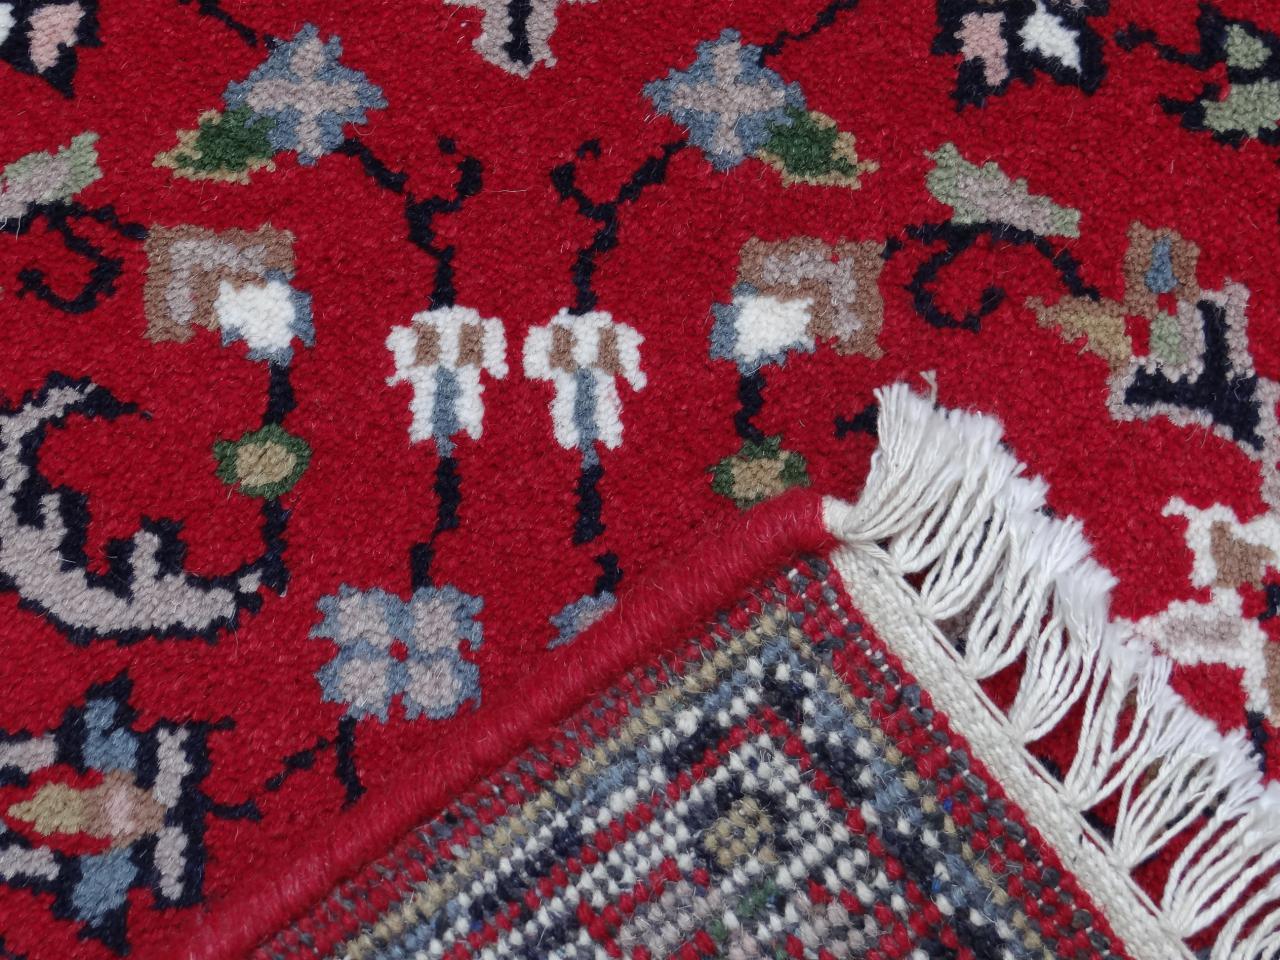 Herabad Floral Rouge Tapis Classiques N 58 90x60cm